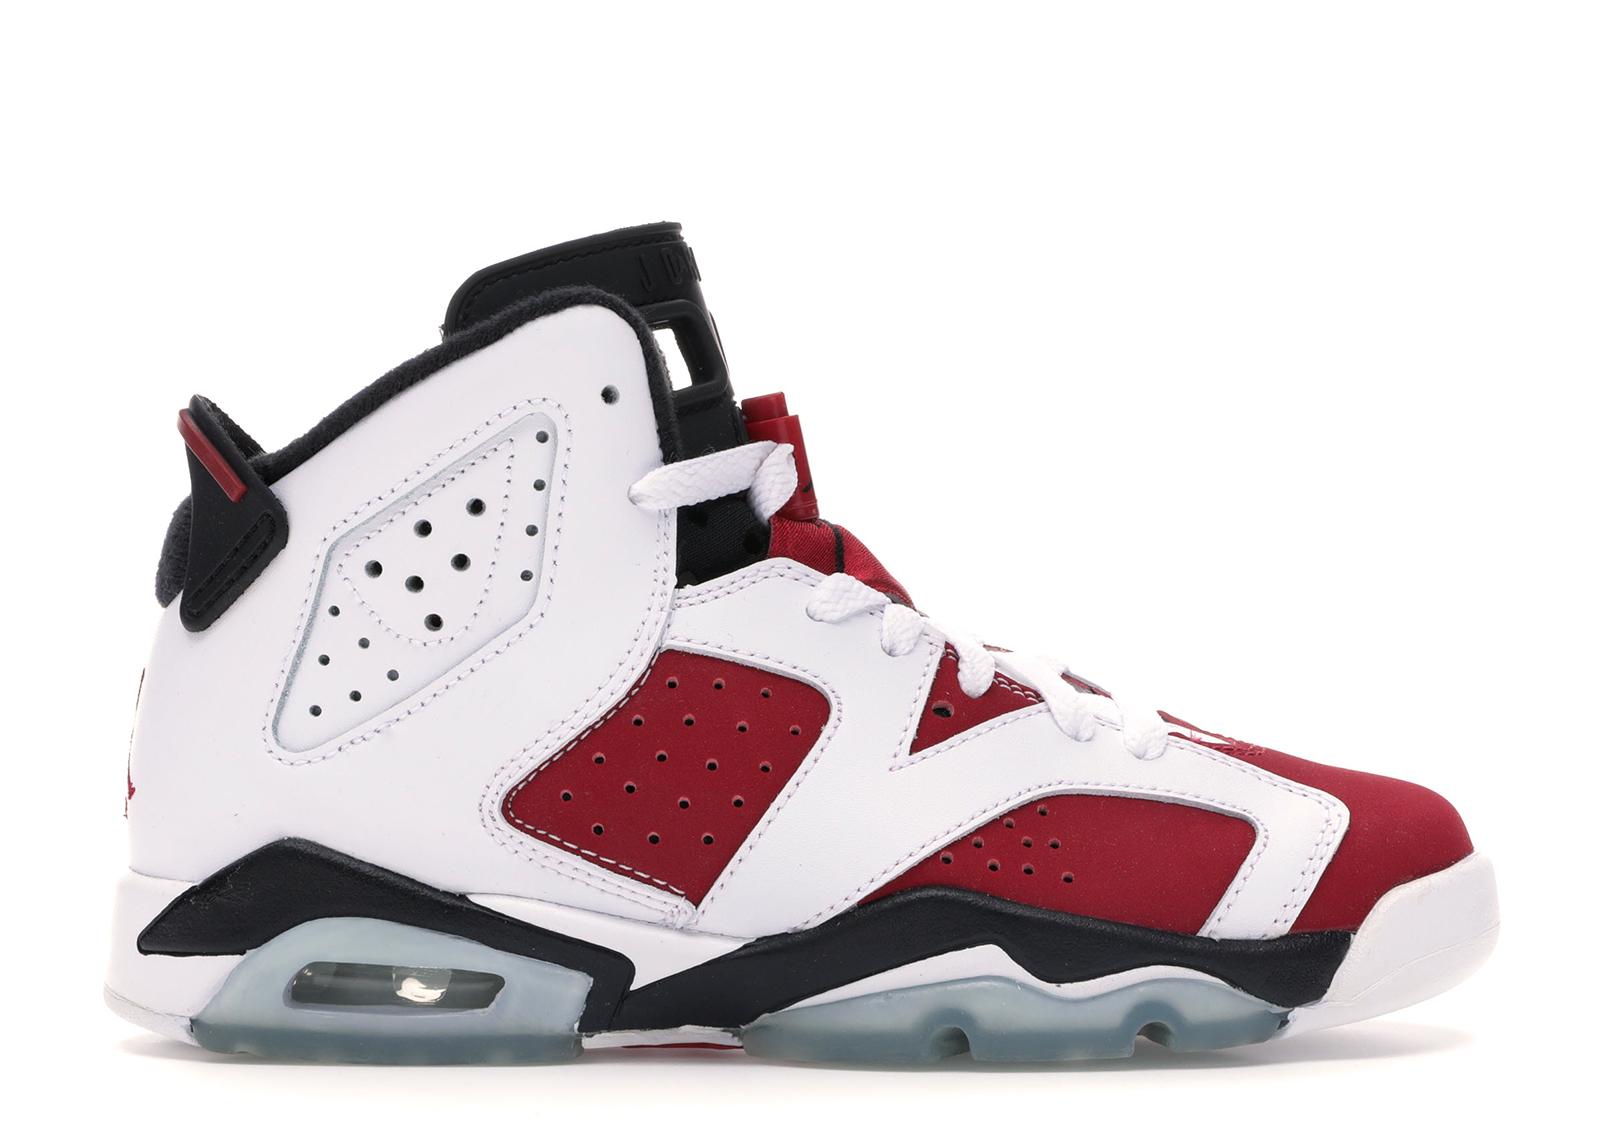 Jordan 6 Retro Carmine 2014 (GS)